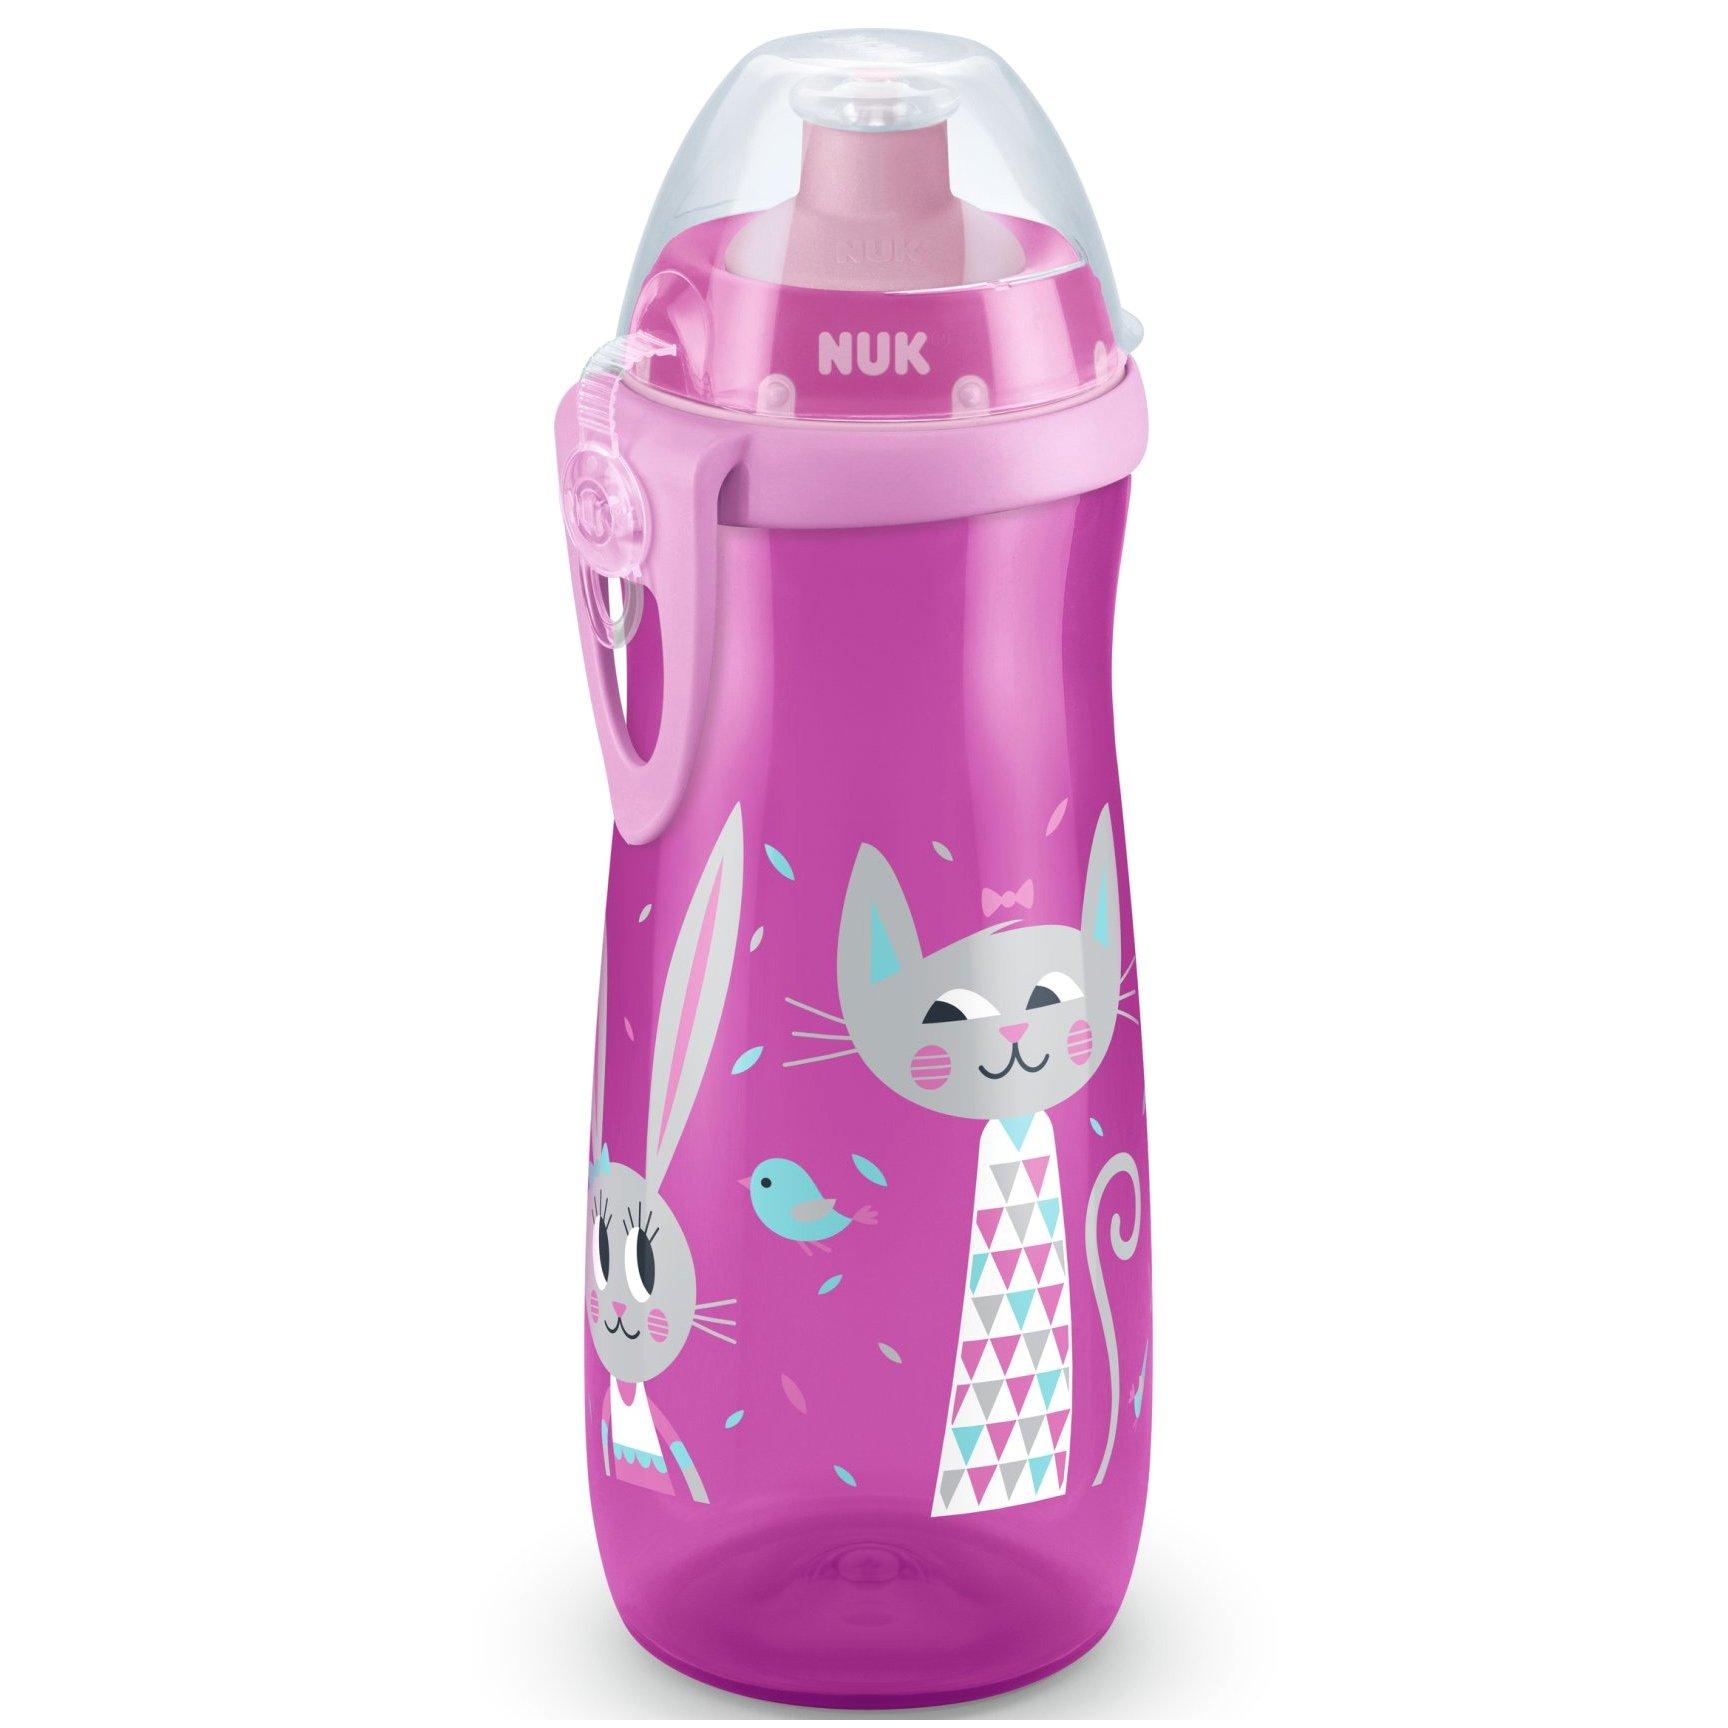 Nuk Sports Cup Παγουράκι Πολυπροπυλενίου BPA Free 450ml – ροζ